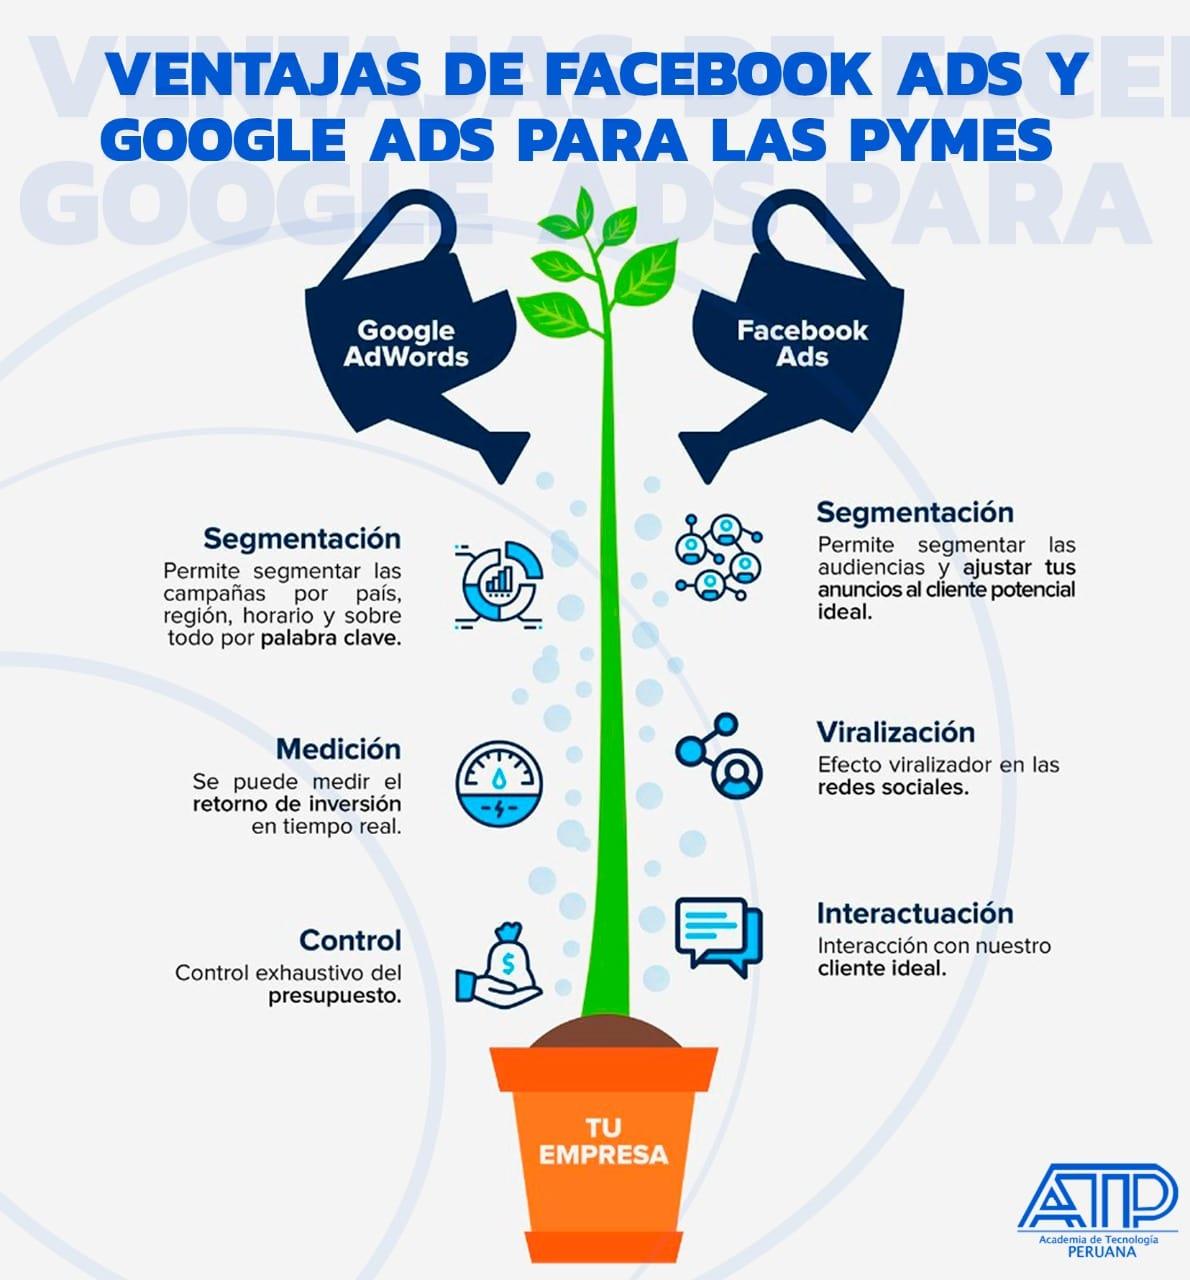 Facebook ADS y Google ADS son dos poderosas plataformas publicitarias.